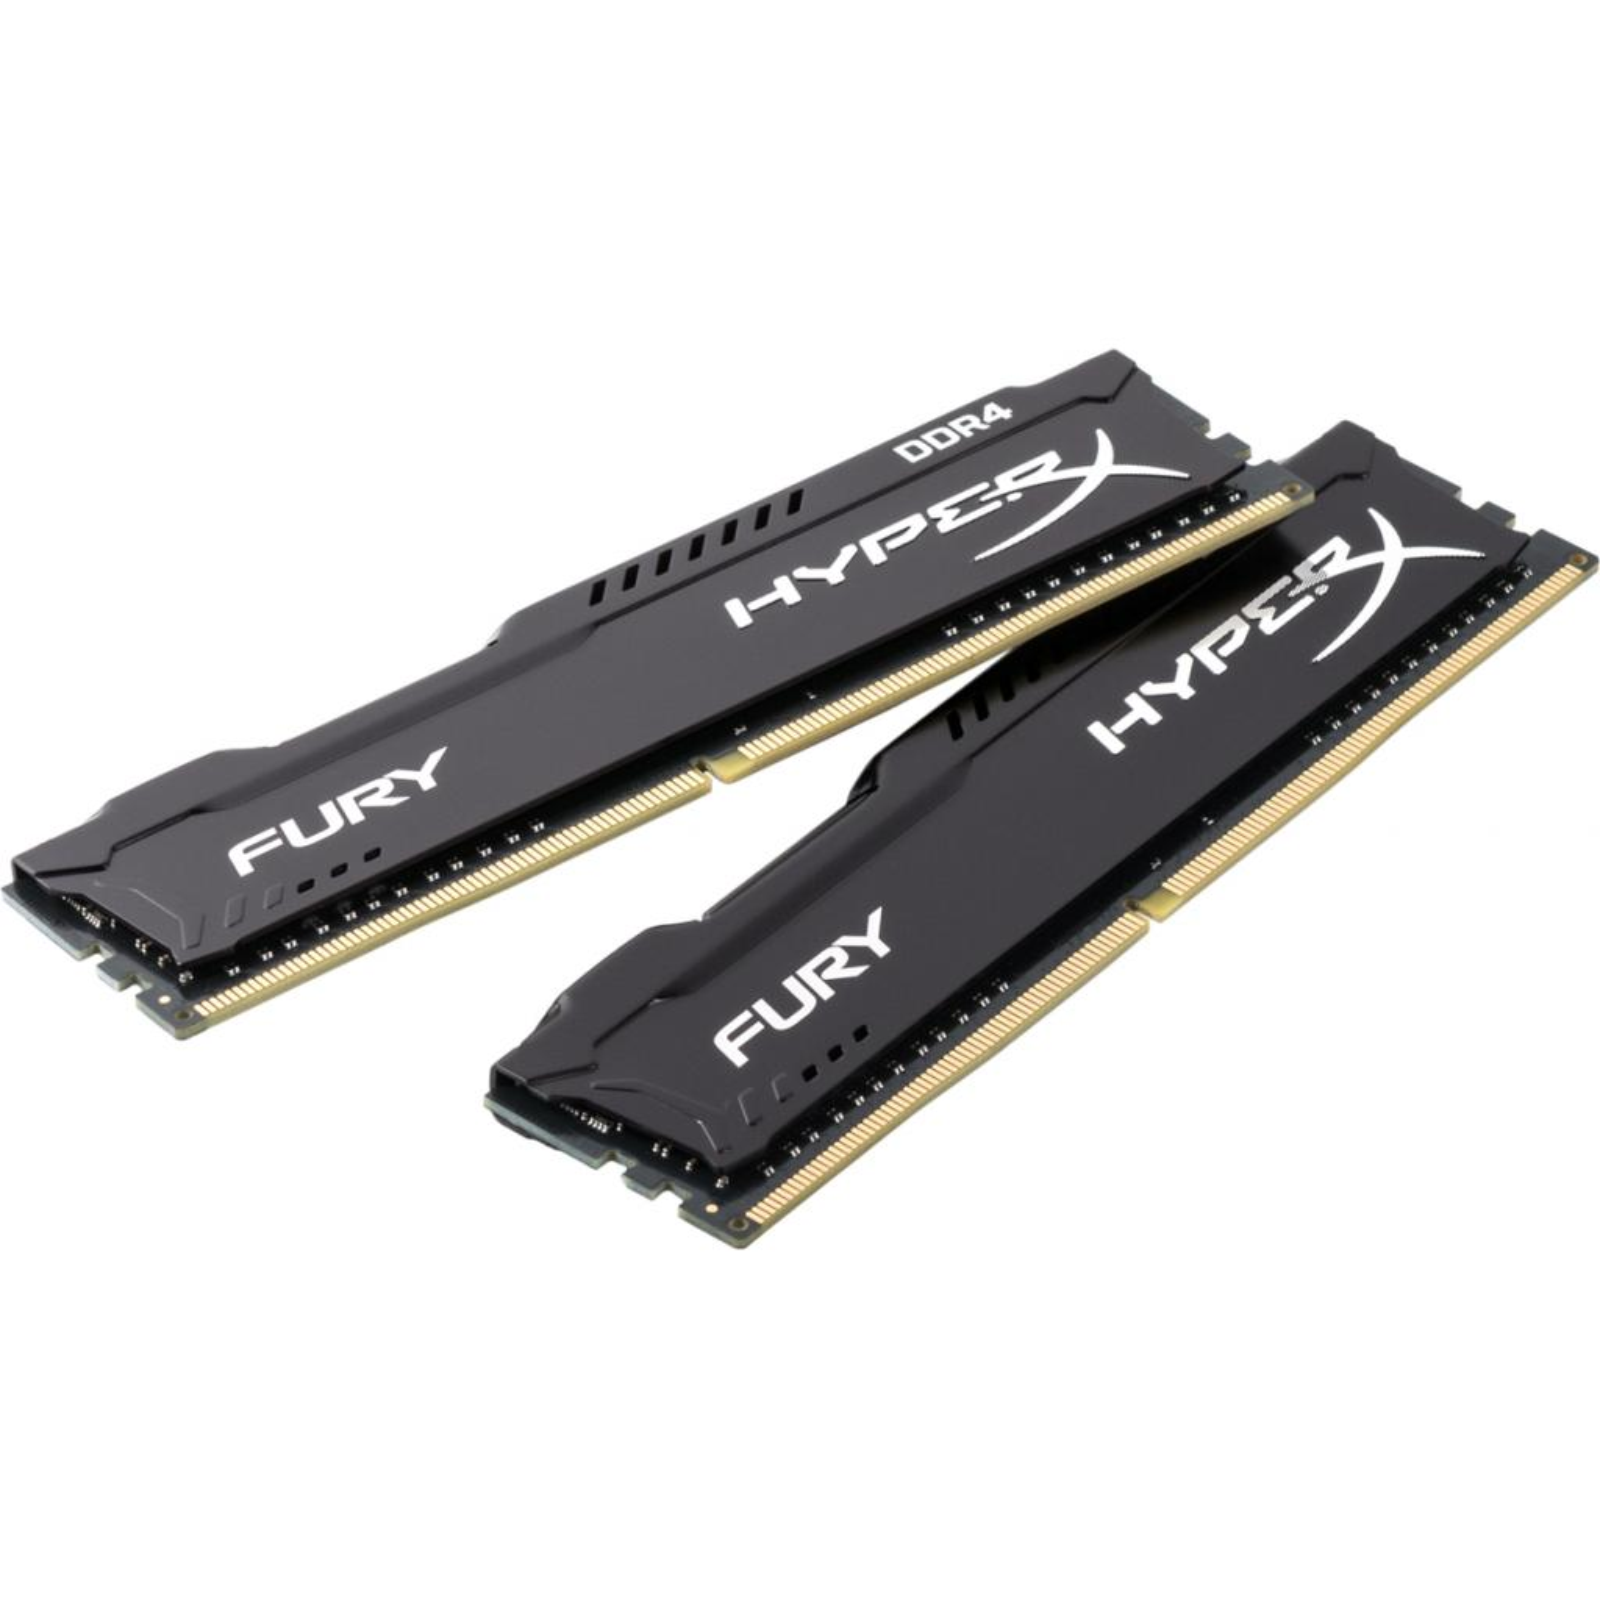 Модуль памяти для компьютера DDR4 16GB (2x8GB) 2133 MHz HyperX FURY Black HyperX (Kingston Fury) (HX421C14FB2K2/16)